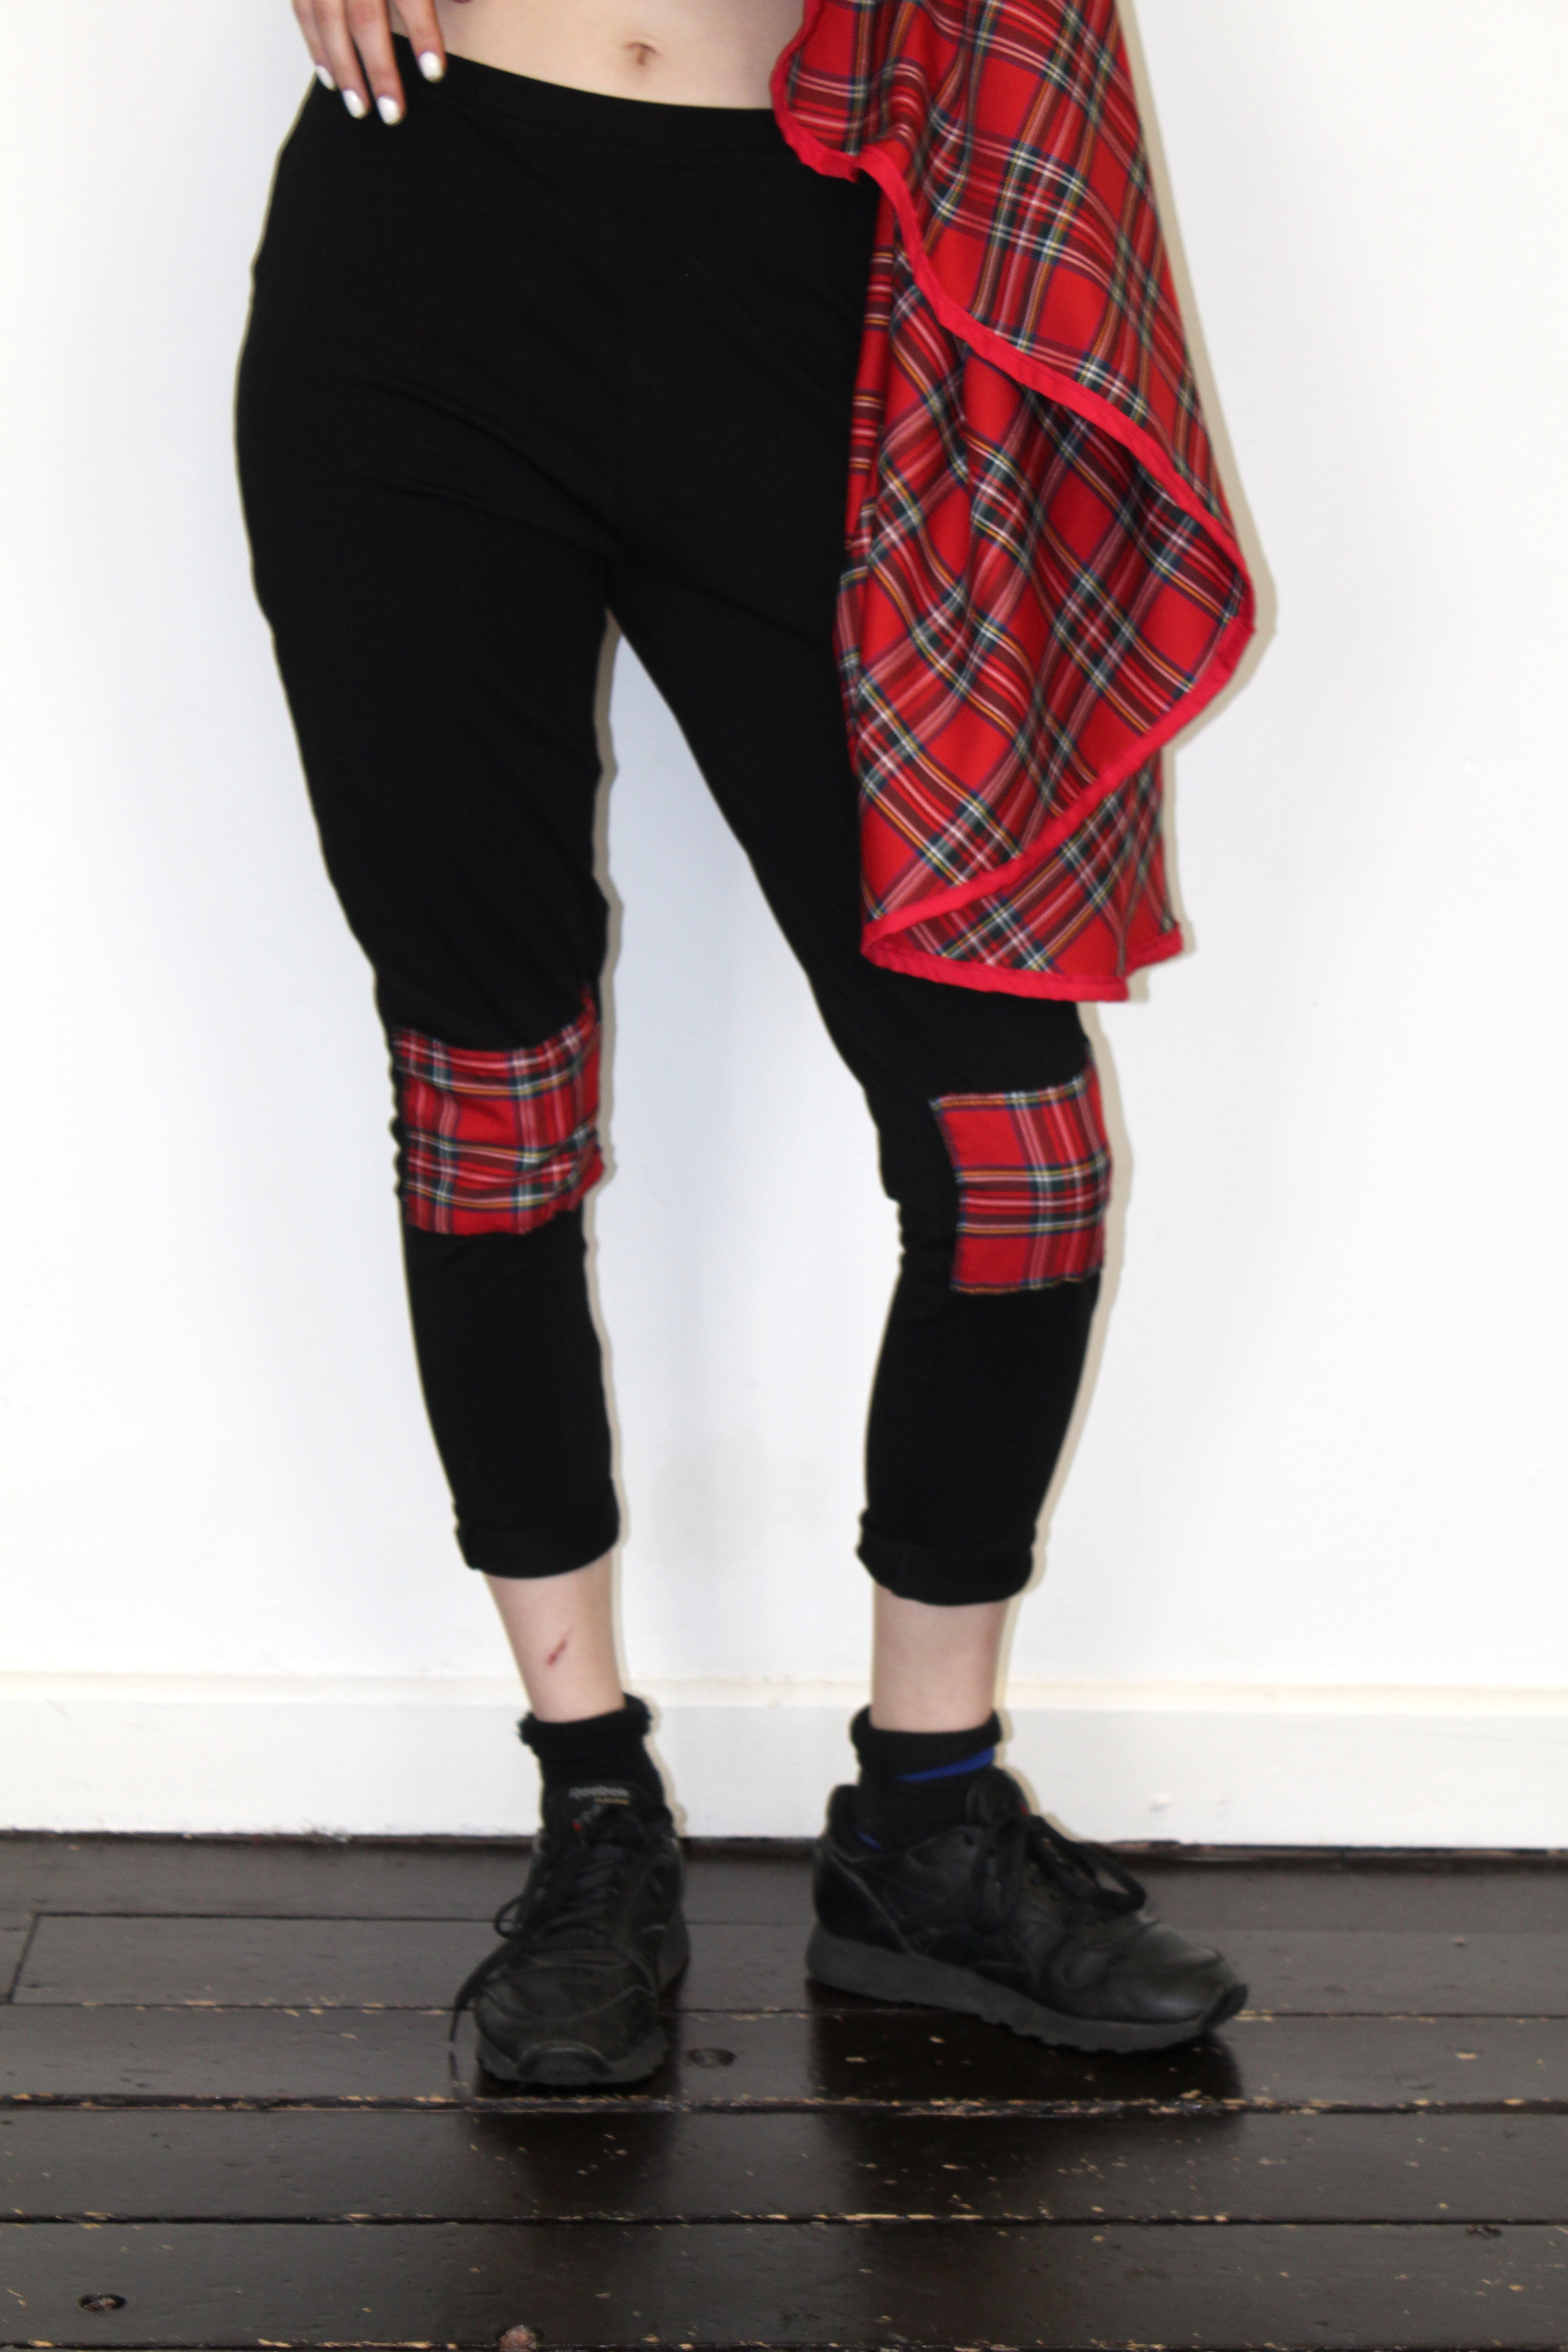 rebelsmarket_pretty_disturbia_black_tartan_panelled_punk_grunge_leggings_leggings_2.jpg